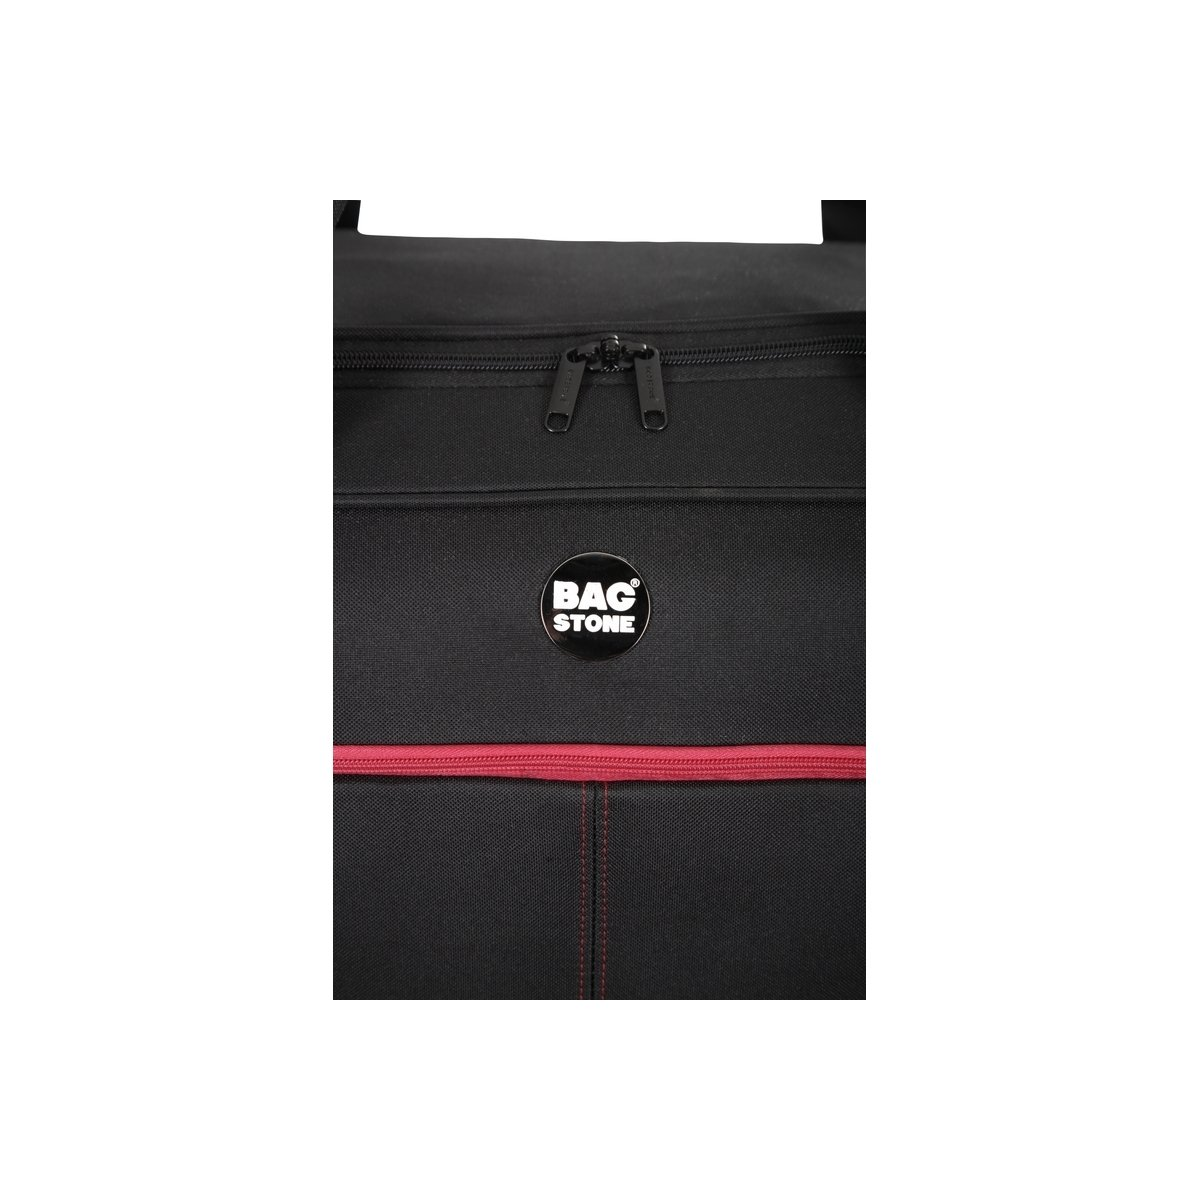 BAG-STONE - Bolsa de viaje Negro negro L - 3 semaines: Amazon.es: Equipaje